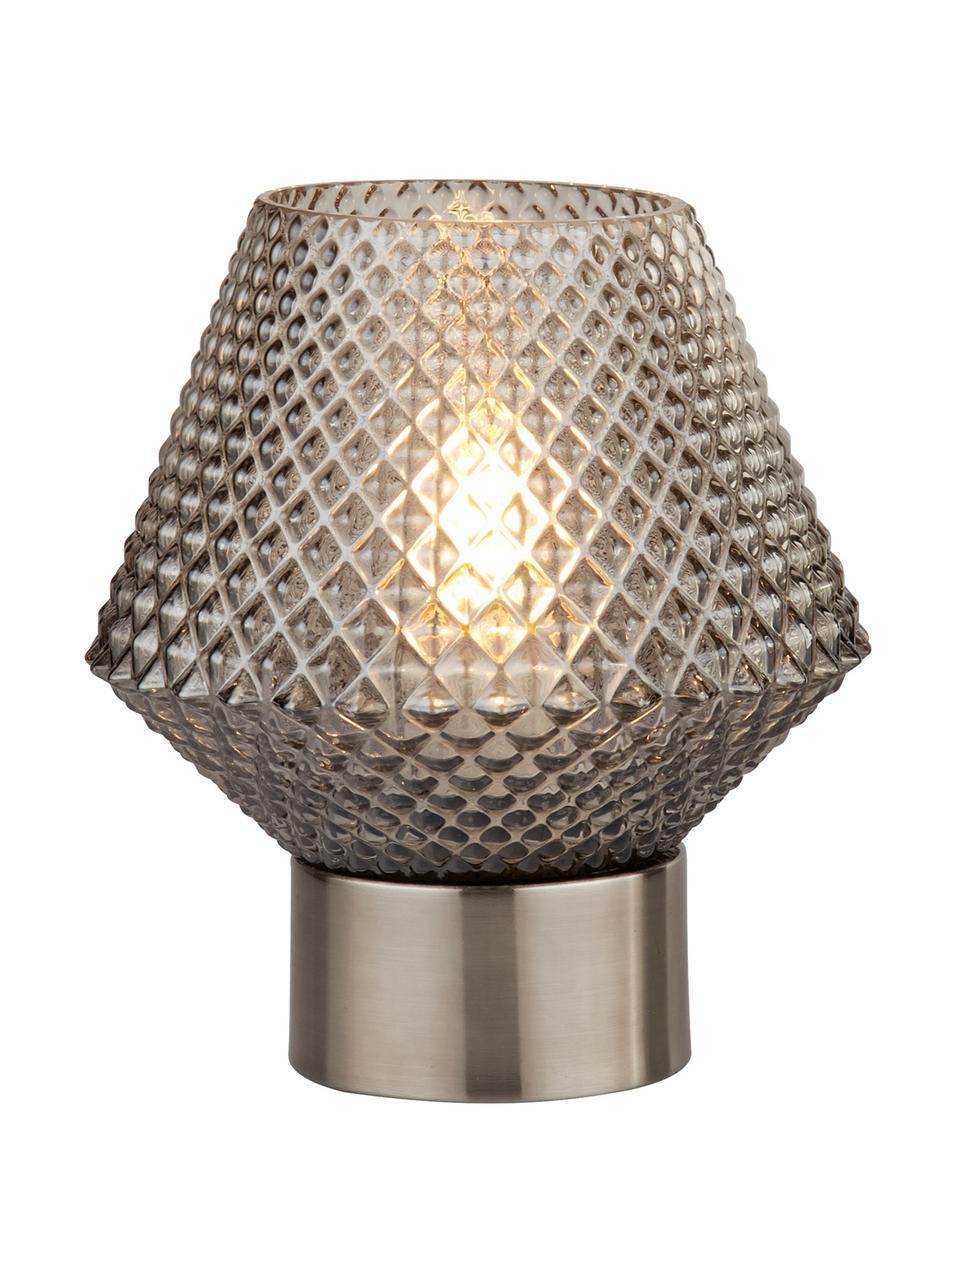 Kleine tafellamp Luisville van glas, Voetstuk: gecoat staal, Lampenkap: glas, Grijs, Ø 15 x H 18 cm